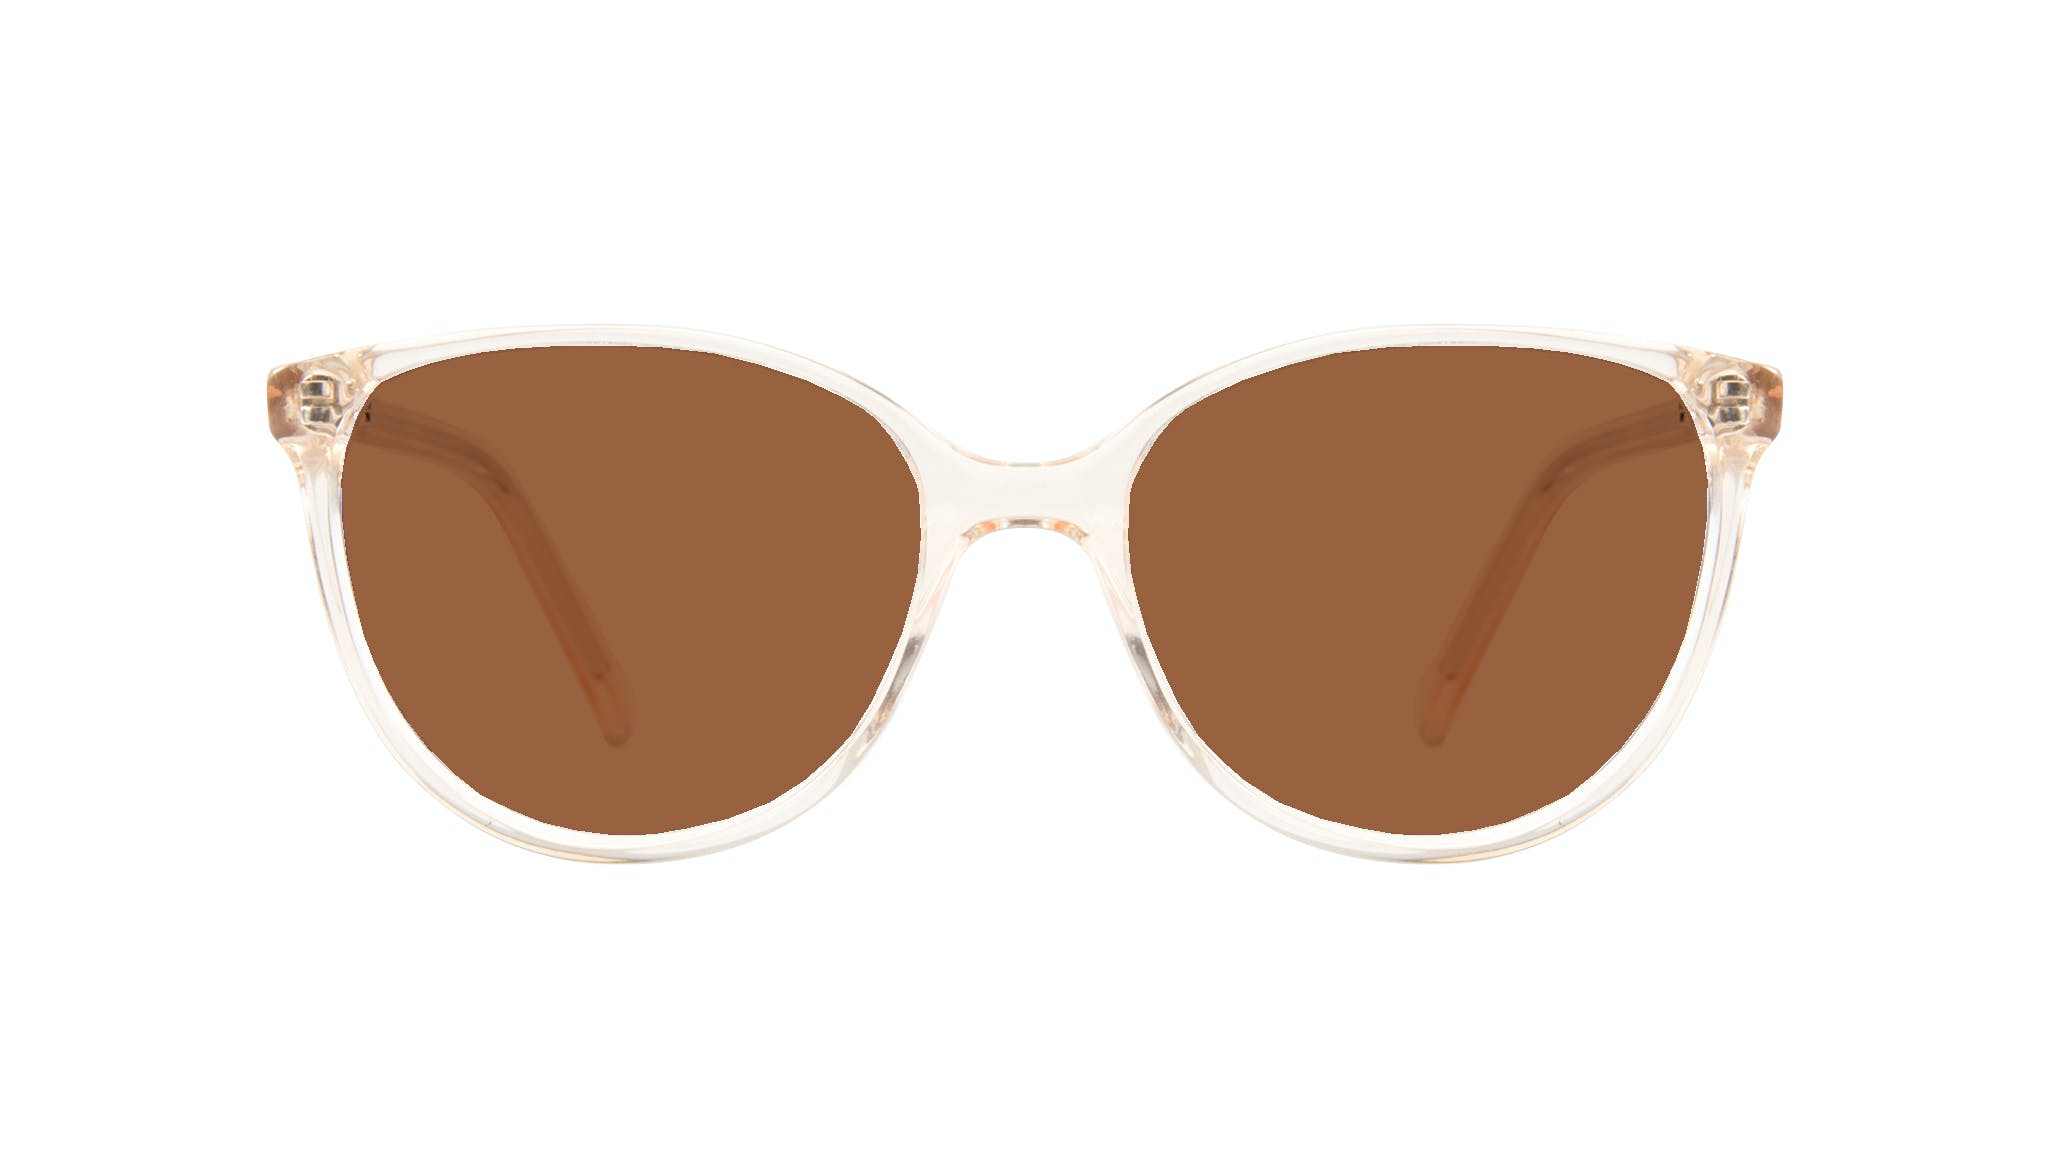 Affordable Fashion Glasses Round Sunglasses Women Imagine Petite Blond Front